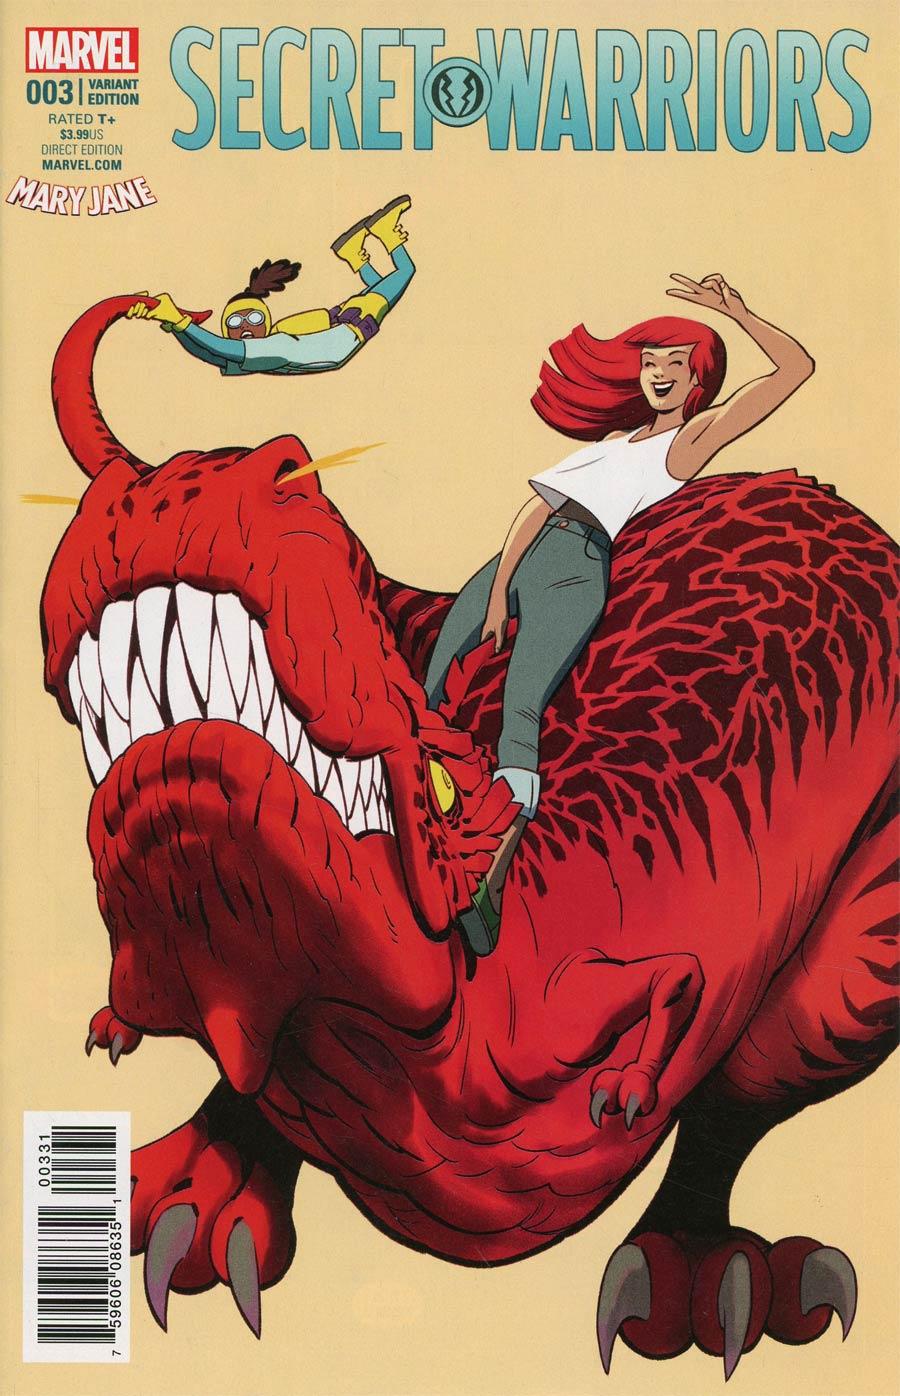 Secret Warriors Vol 2 #3 Cover B Variant Javier Rodriquez Mary Jane Cover (Secret Empire Tie-In)